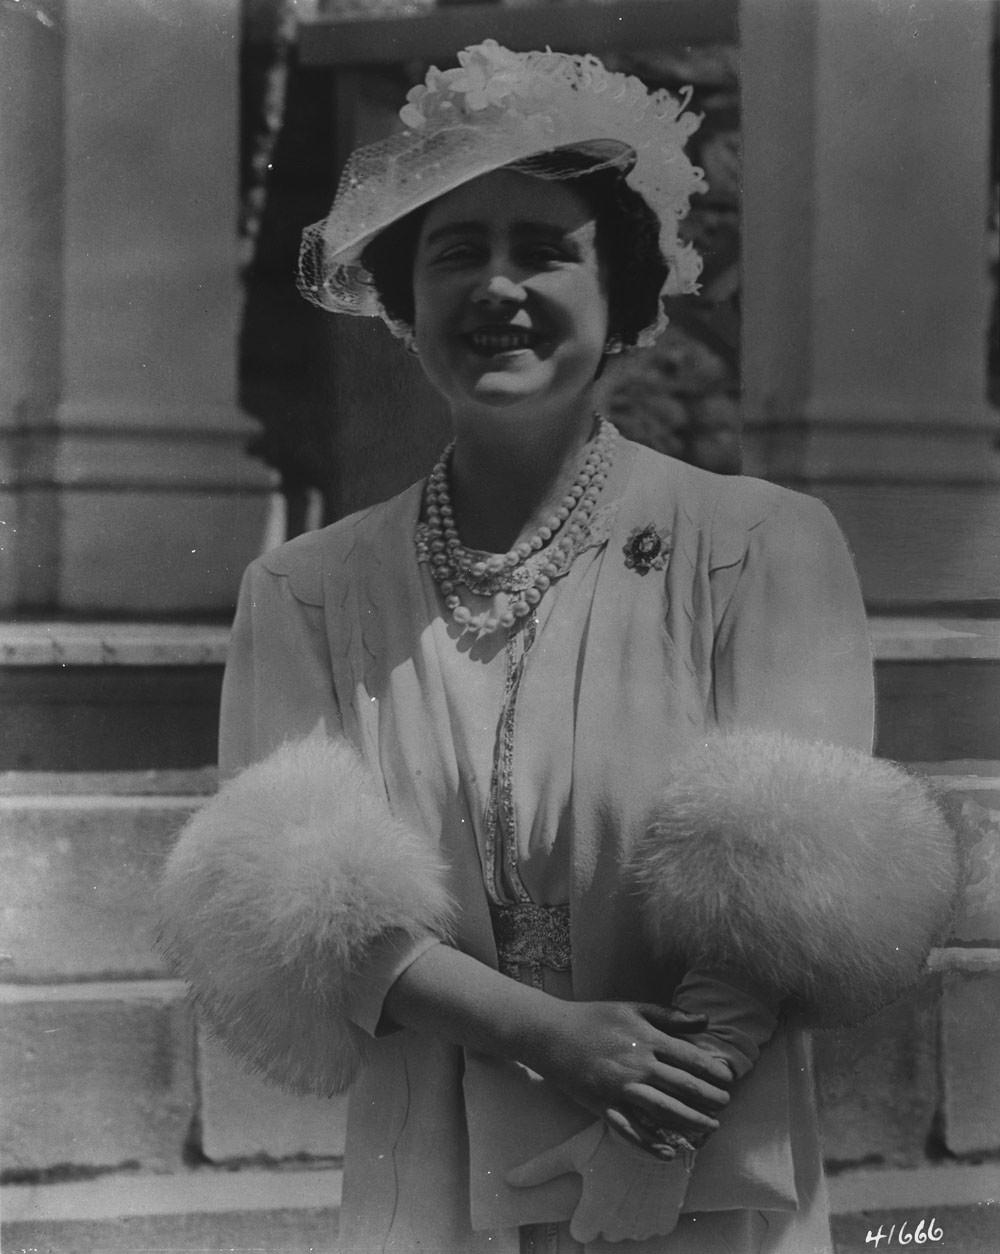 Elizabeth Angela Marguerite Bowes-Lyon, Queen Elizabeth The Queen Mother